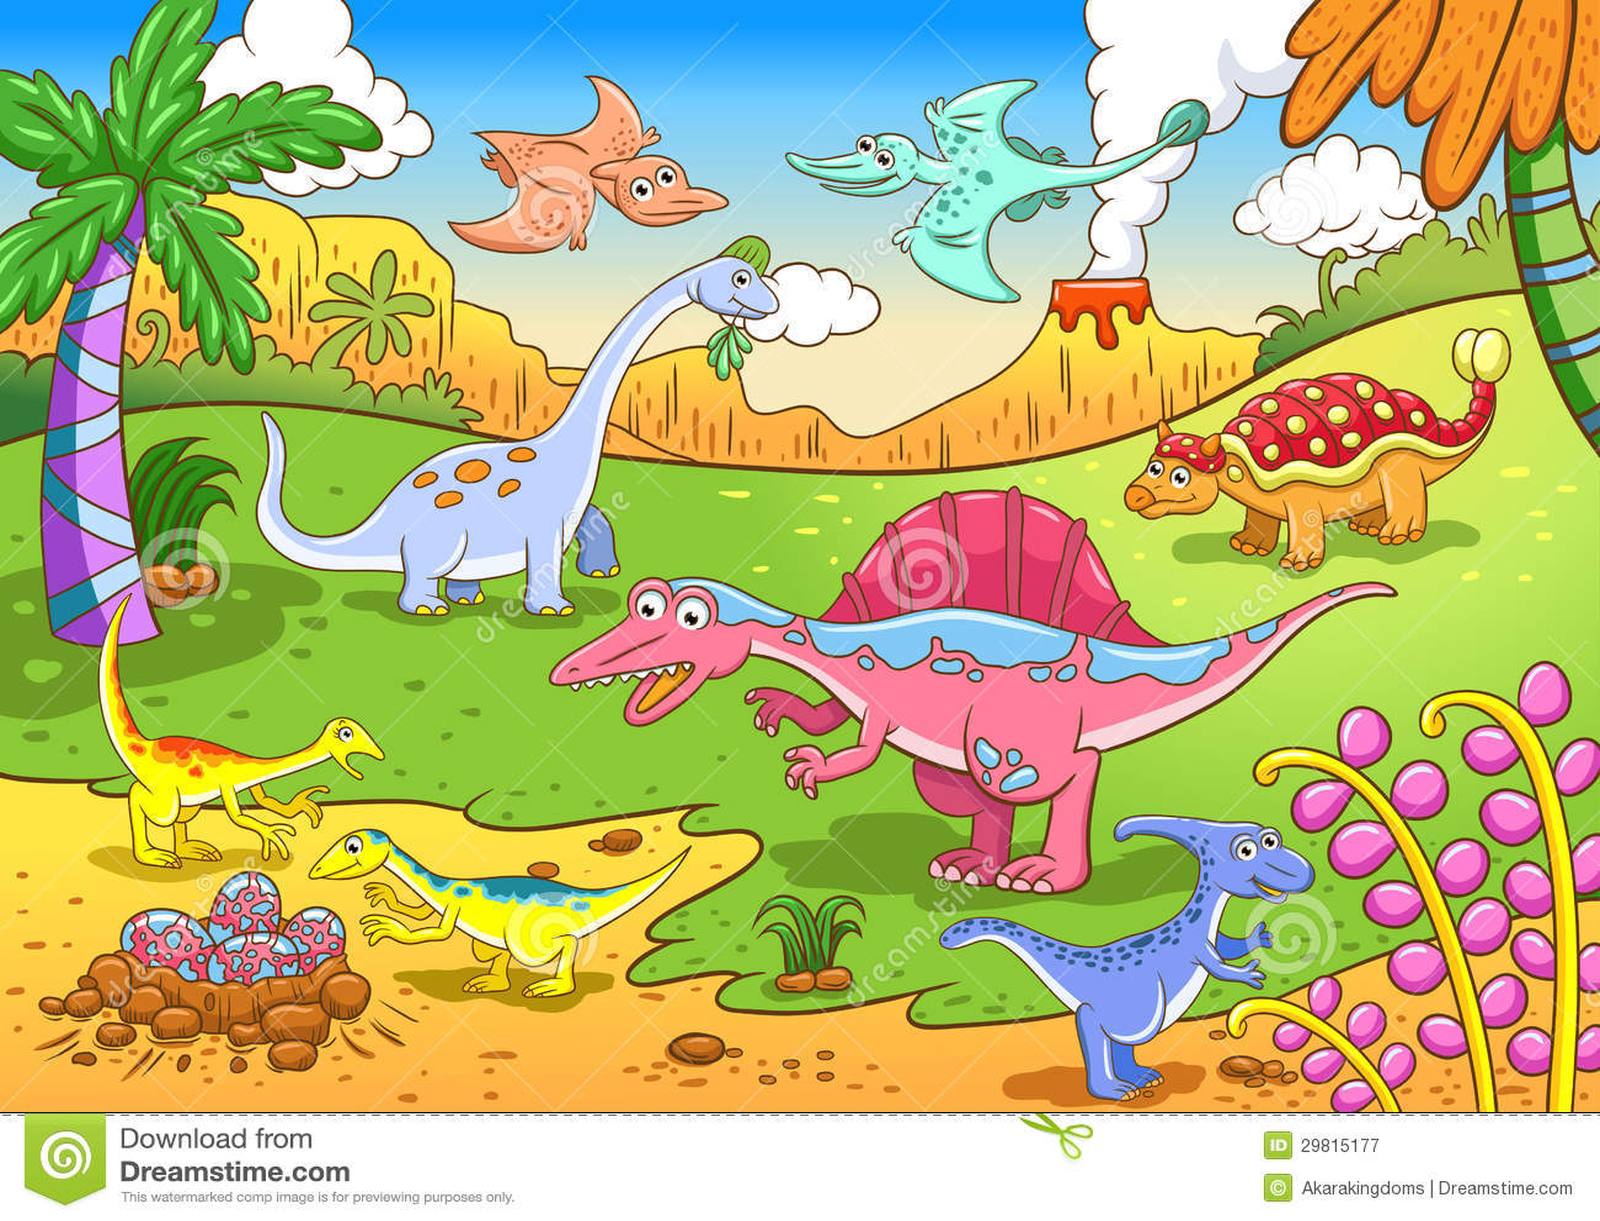 Cute Dinosaurs In Prehistoric Scene Stock Vector Illustration Of Cartoon Prehistoric 29815177